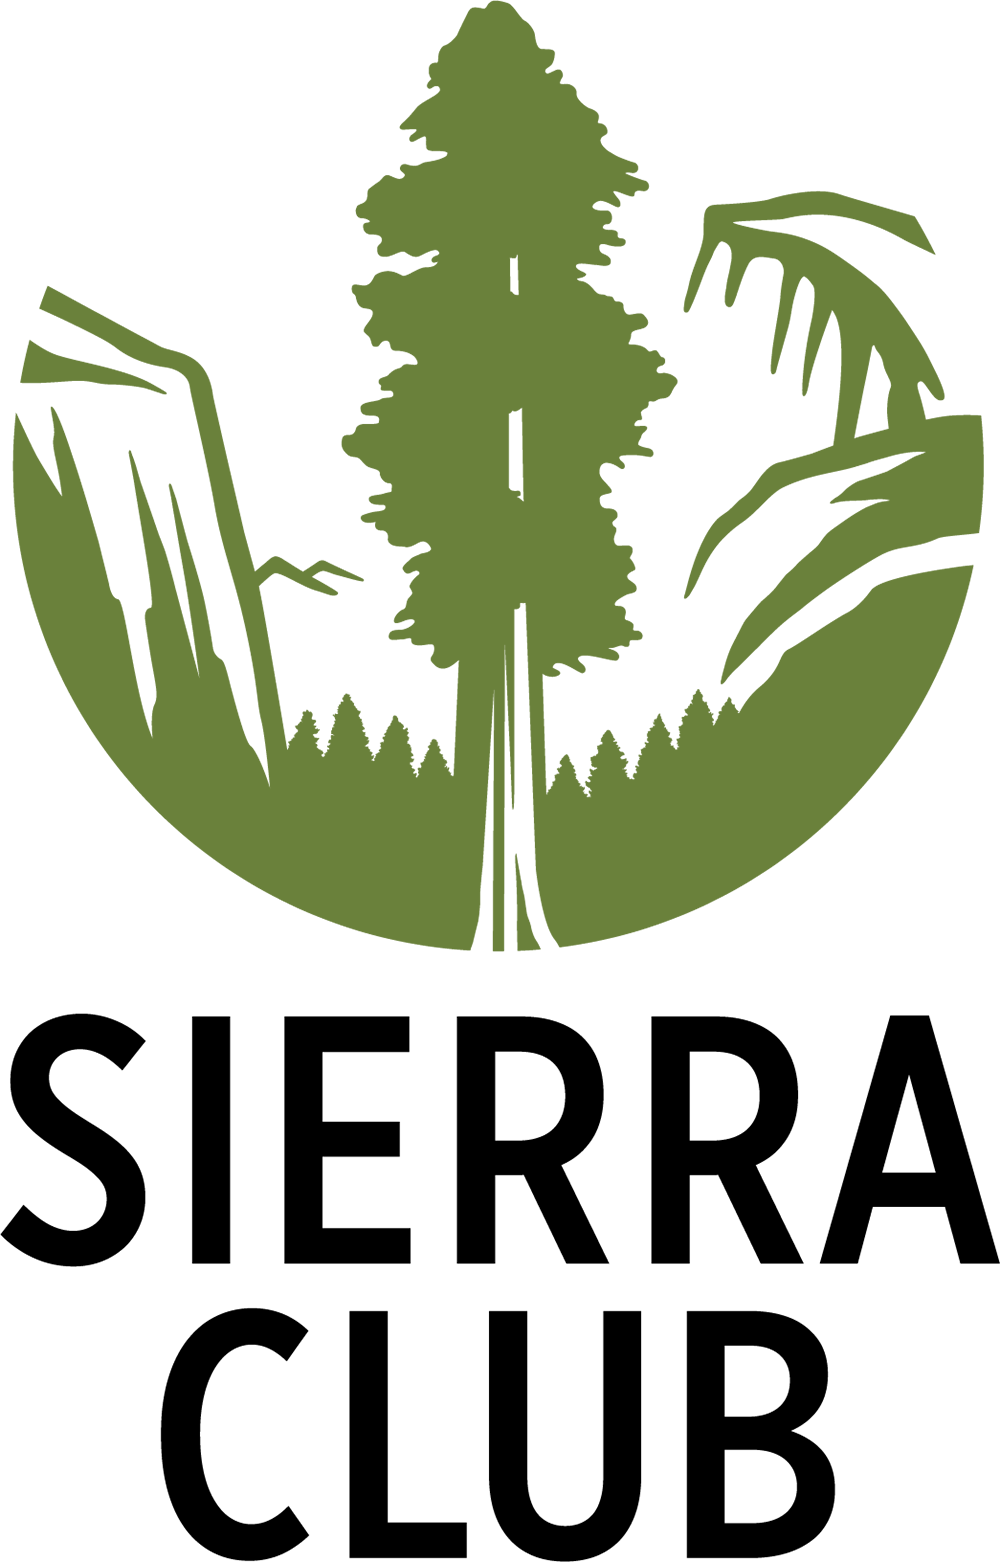 Sierra club logo clipart vector black and white download Sierra Club Logo History | Sierra Club vector black and white download